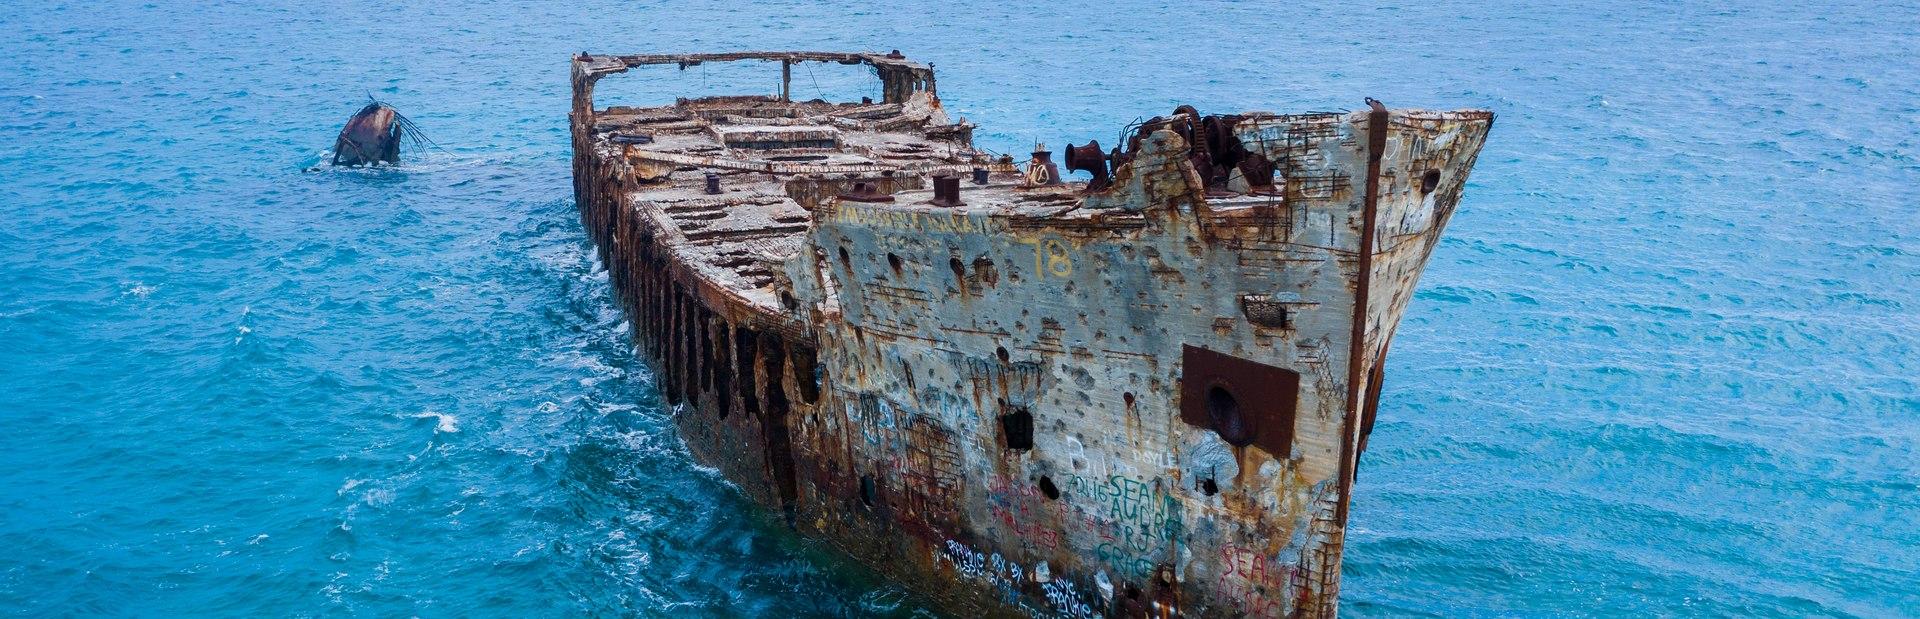 SS Sapona Image 1